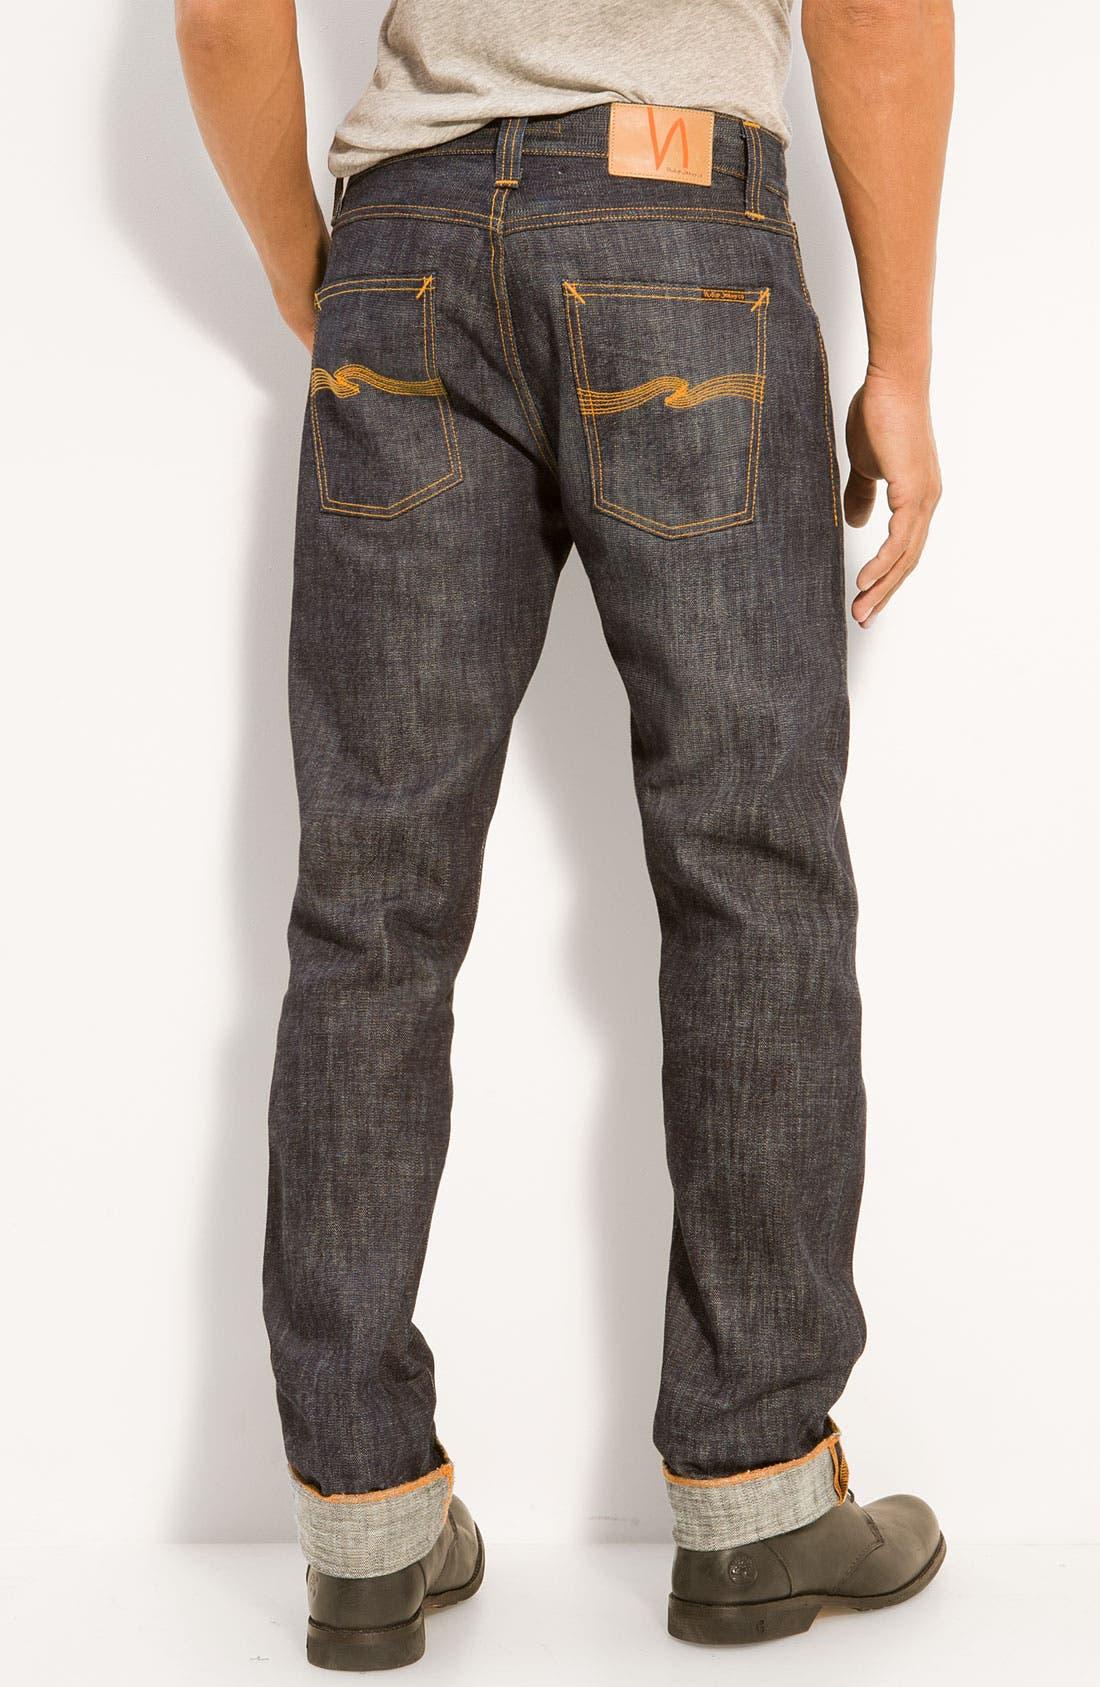 NUDIE JEANS Nudie 'Sharp Bengt' Straight Leg Jeans, Main, color, 400